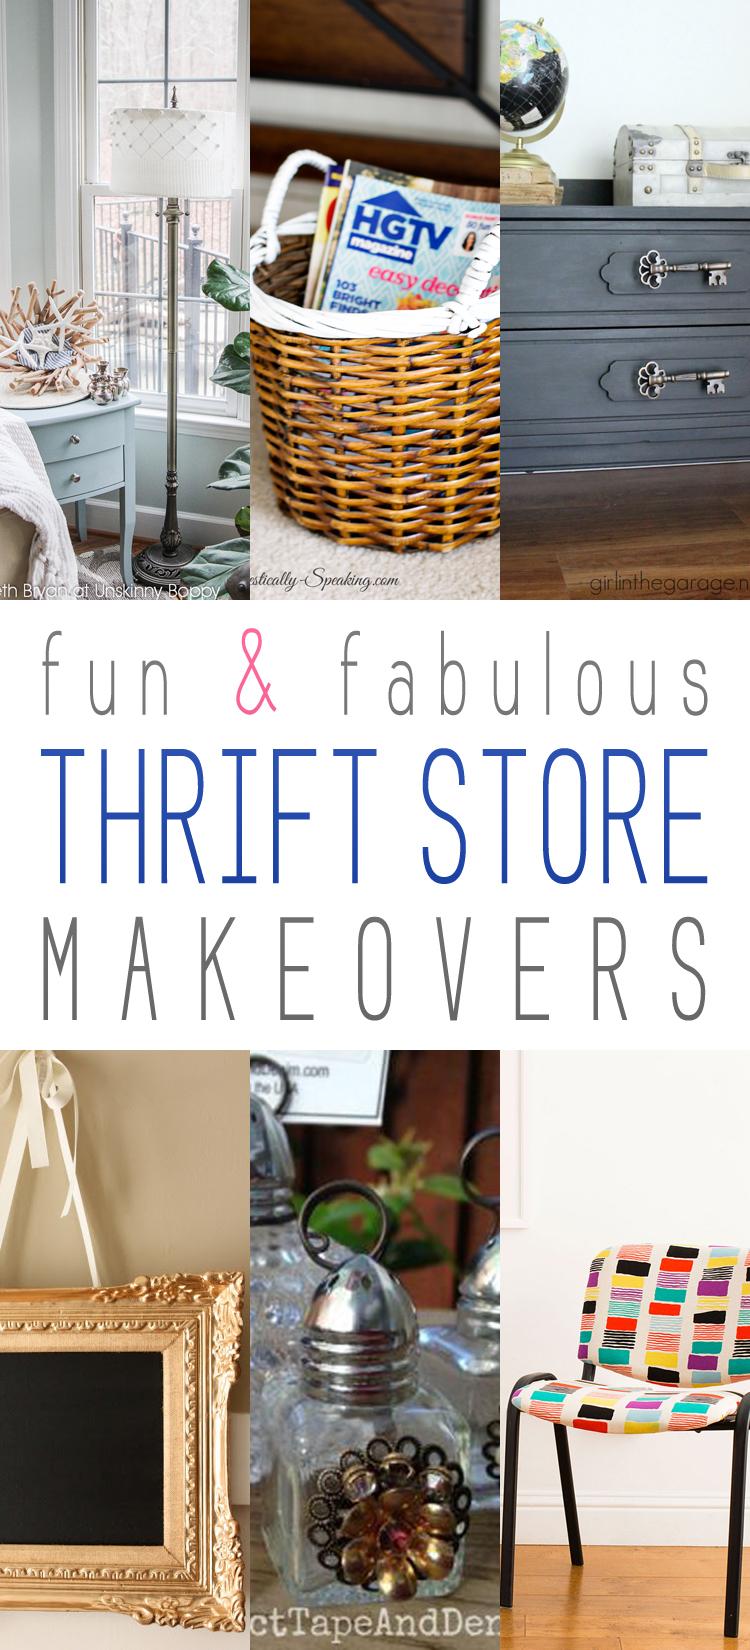 ThriftStoreMakeover-tower-001